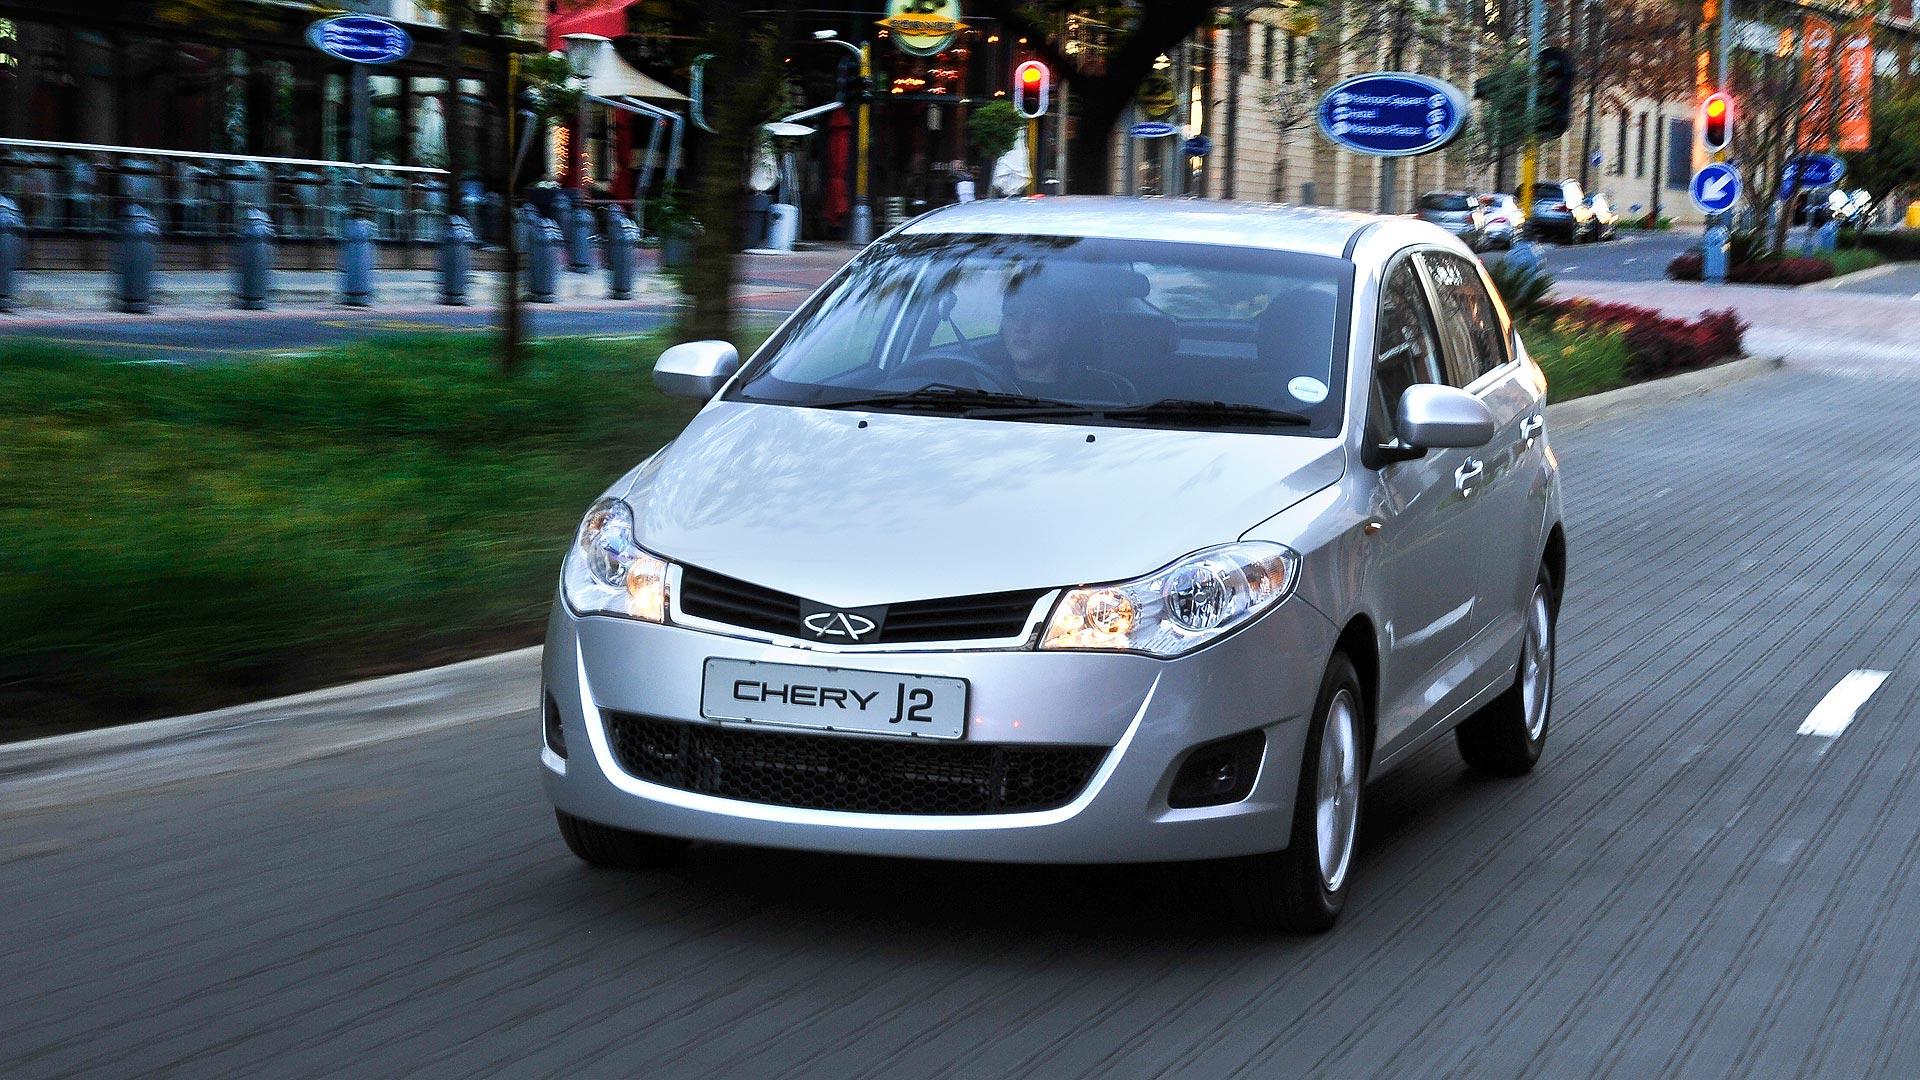 2013 Chery J2 – Launch Drive